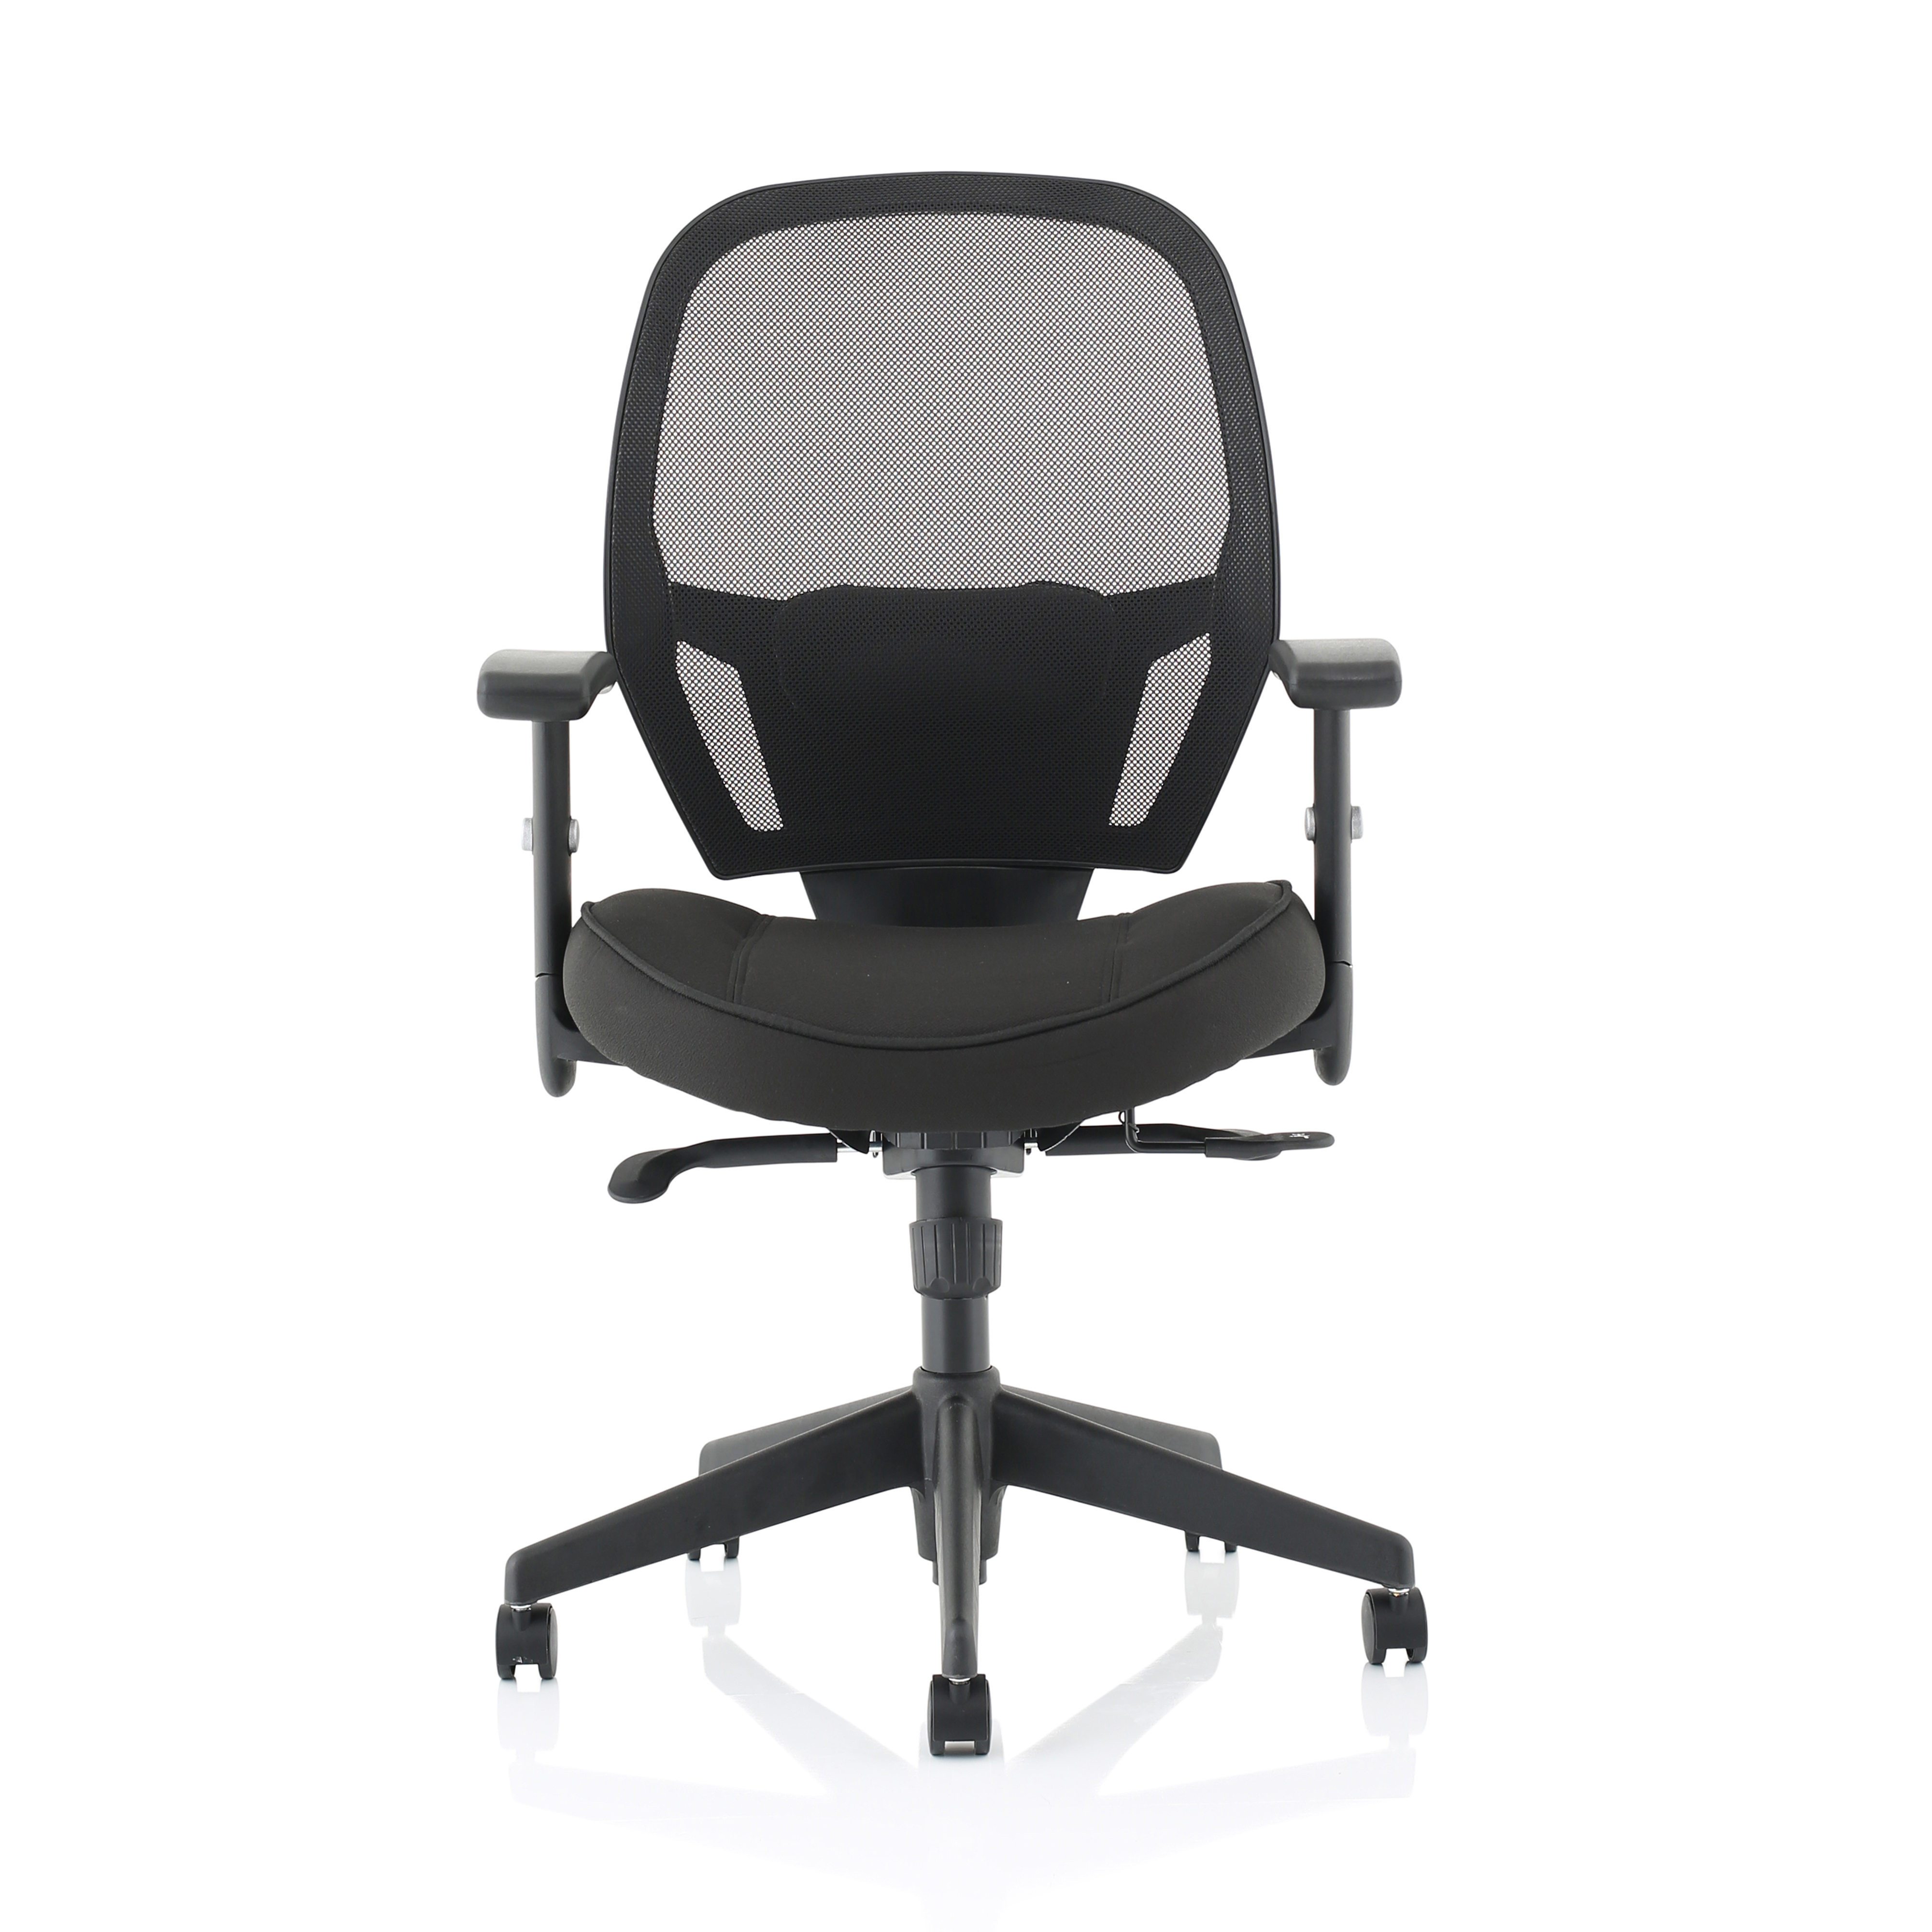 13c4a7b747a Trexus Amaze Synchronous Mesh Chair Black 520x520x470-600mm Ref  11186-02Black